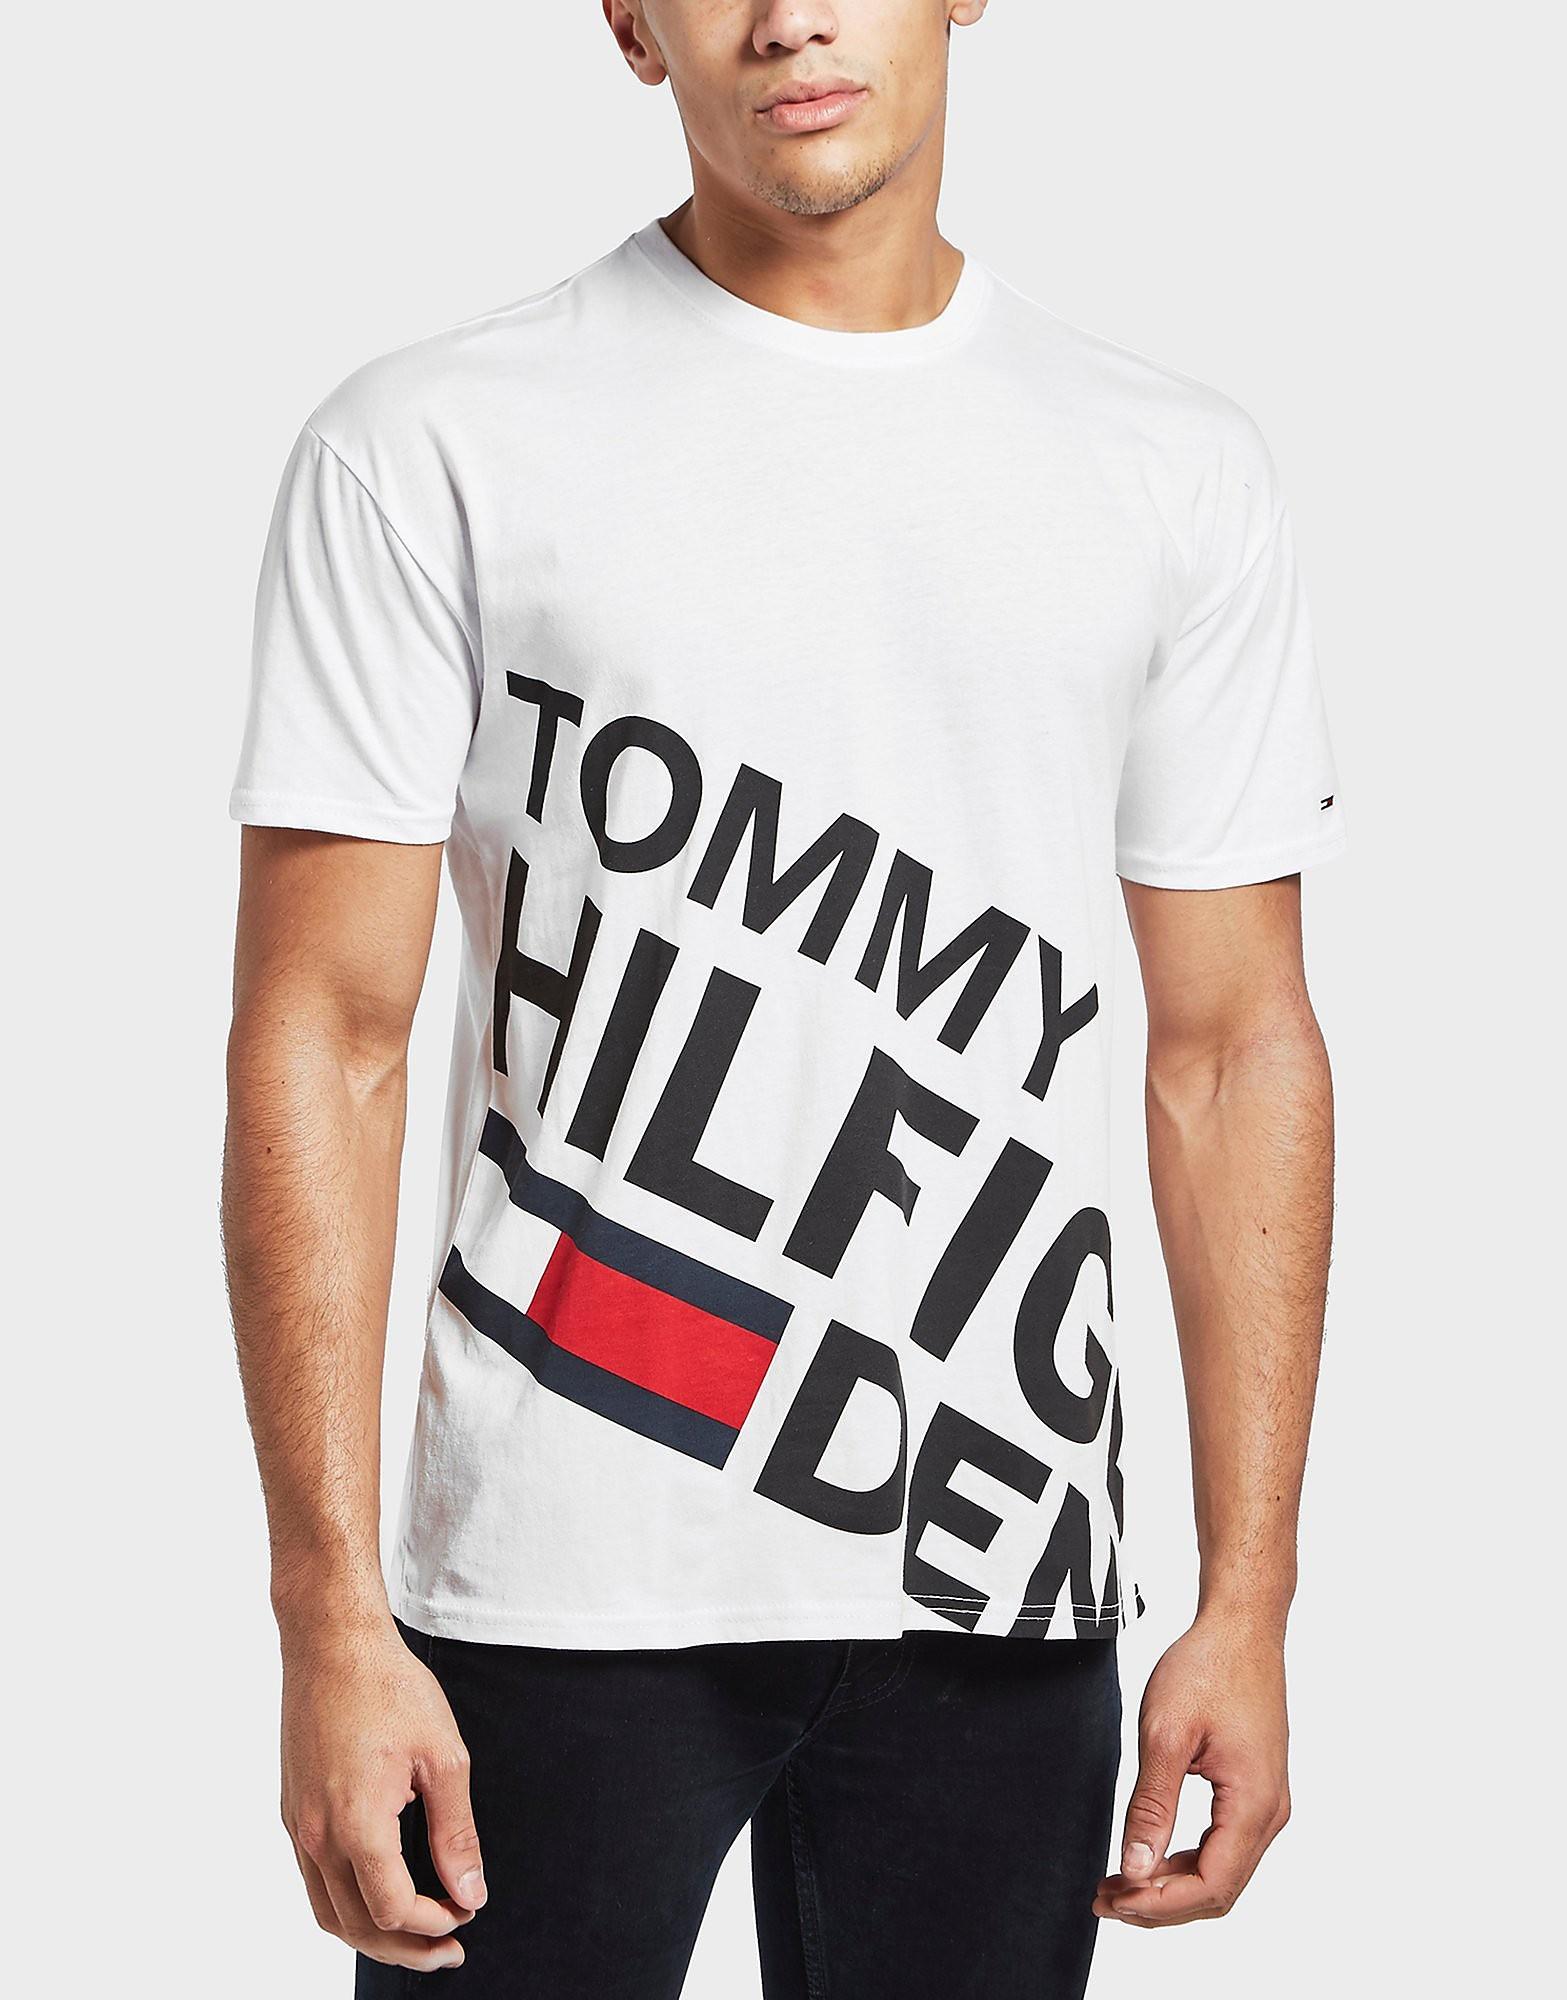 Tommy Hilfiger Slant Logo Short Sleeve T-Shirt